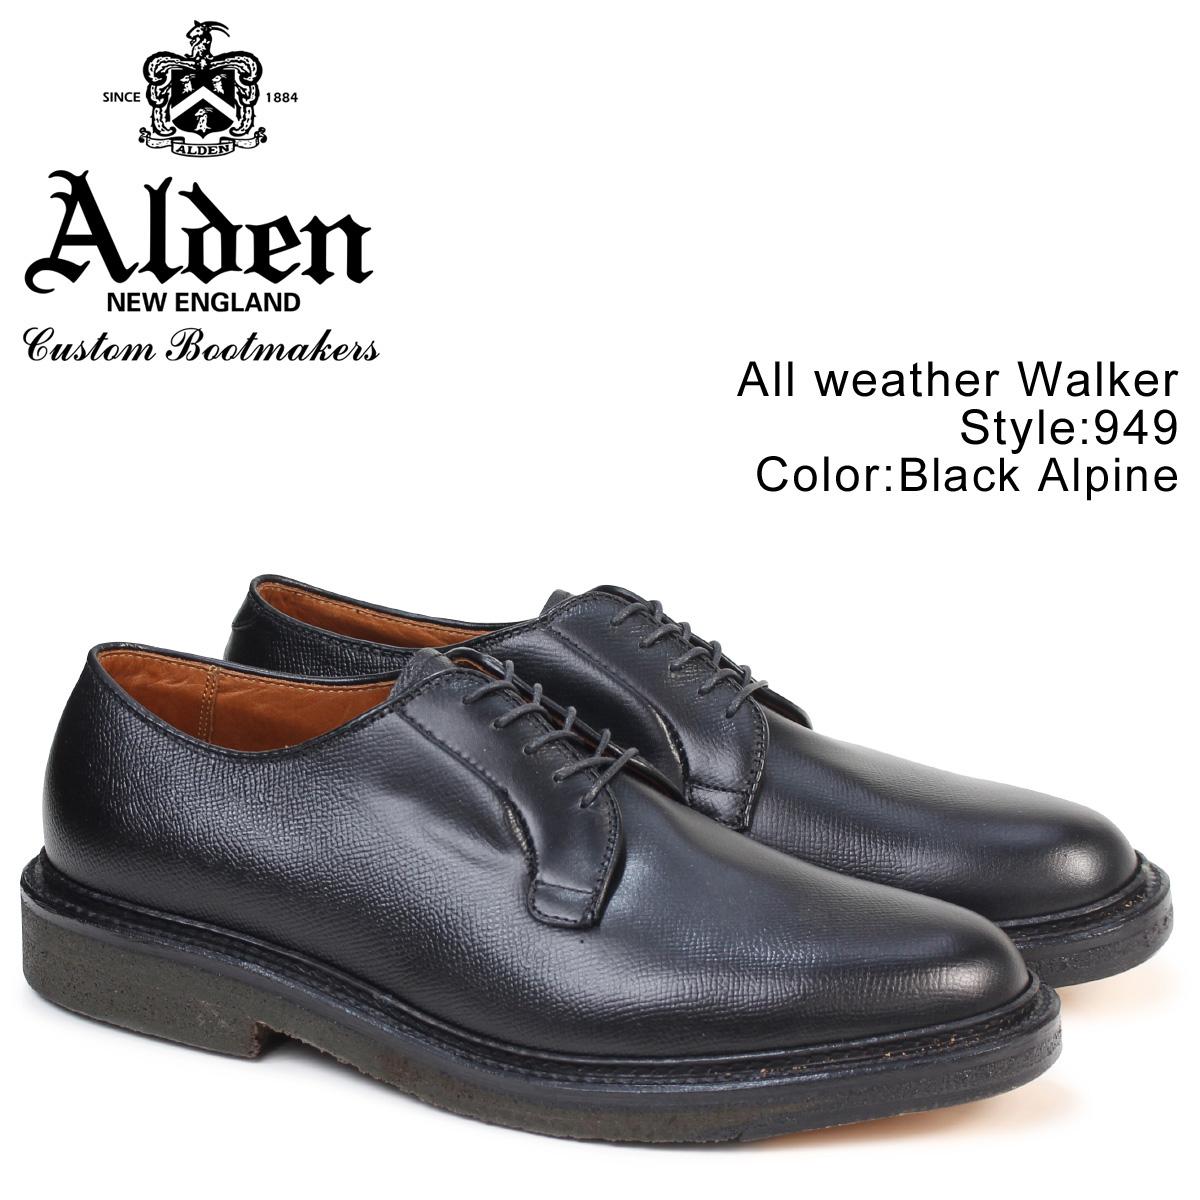 ALDEN オールデン シューズ メンズ ALL WEATHER WALKER Dワイズ 949